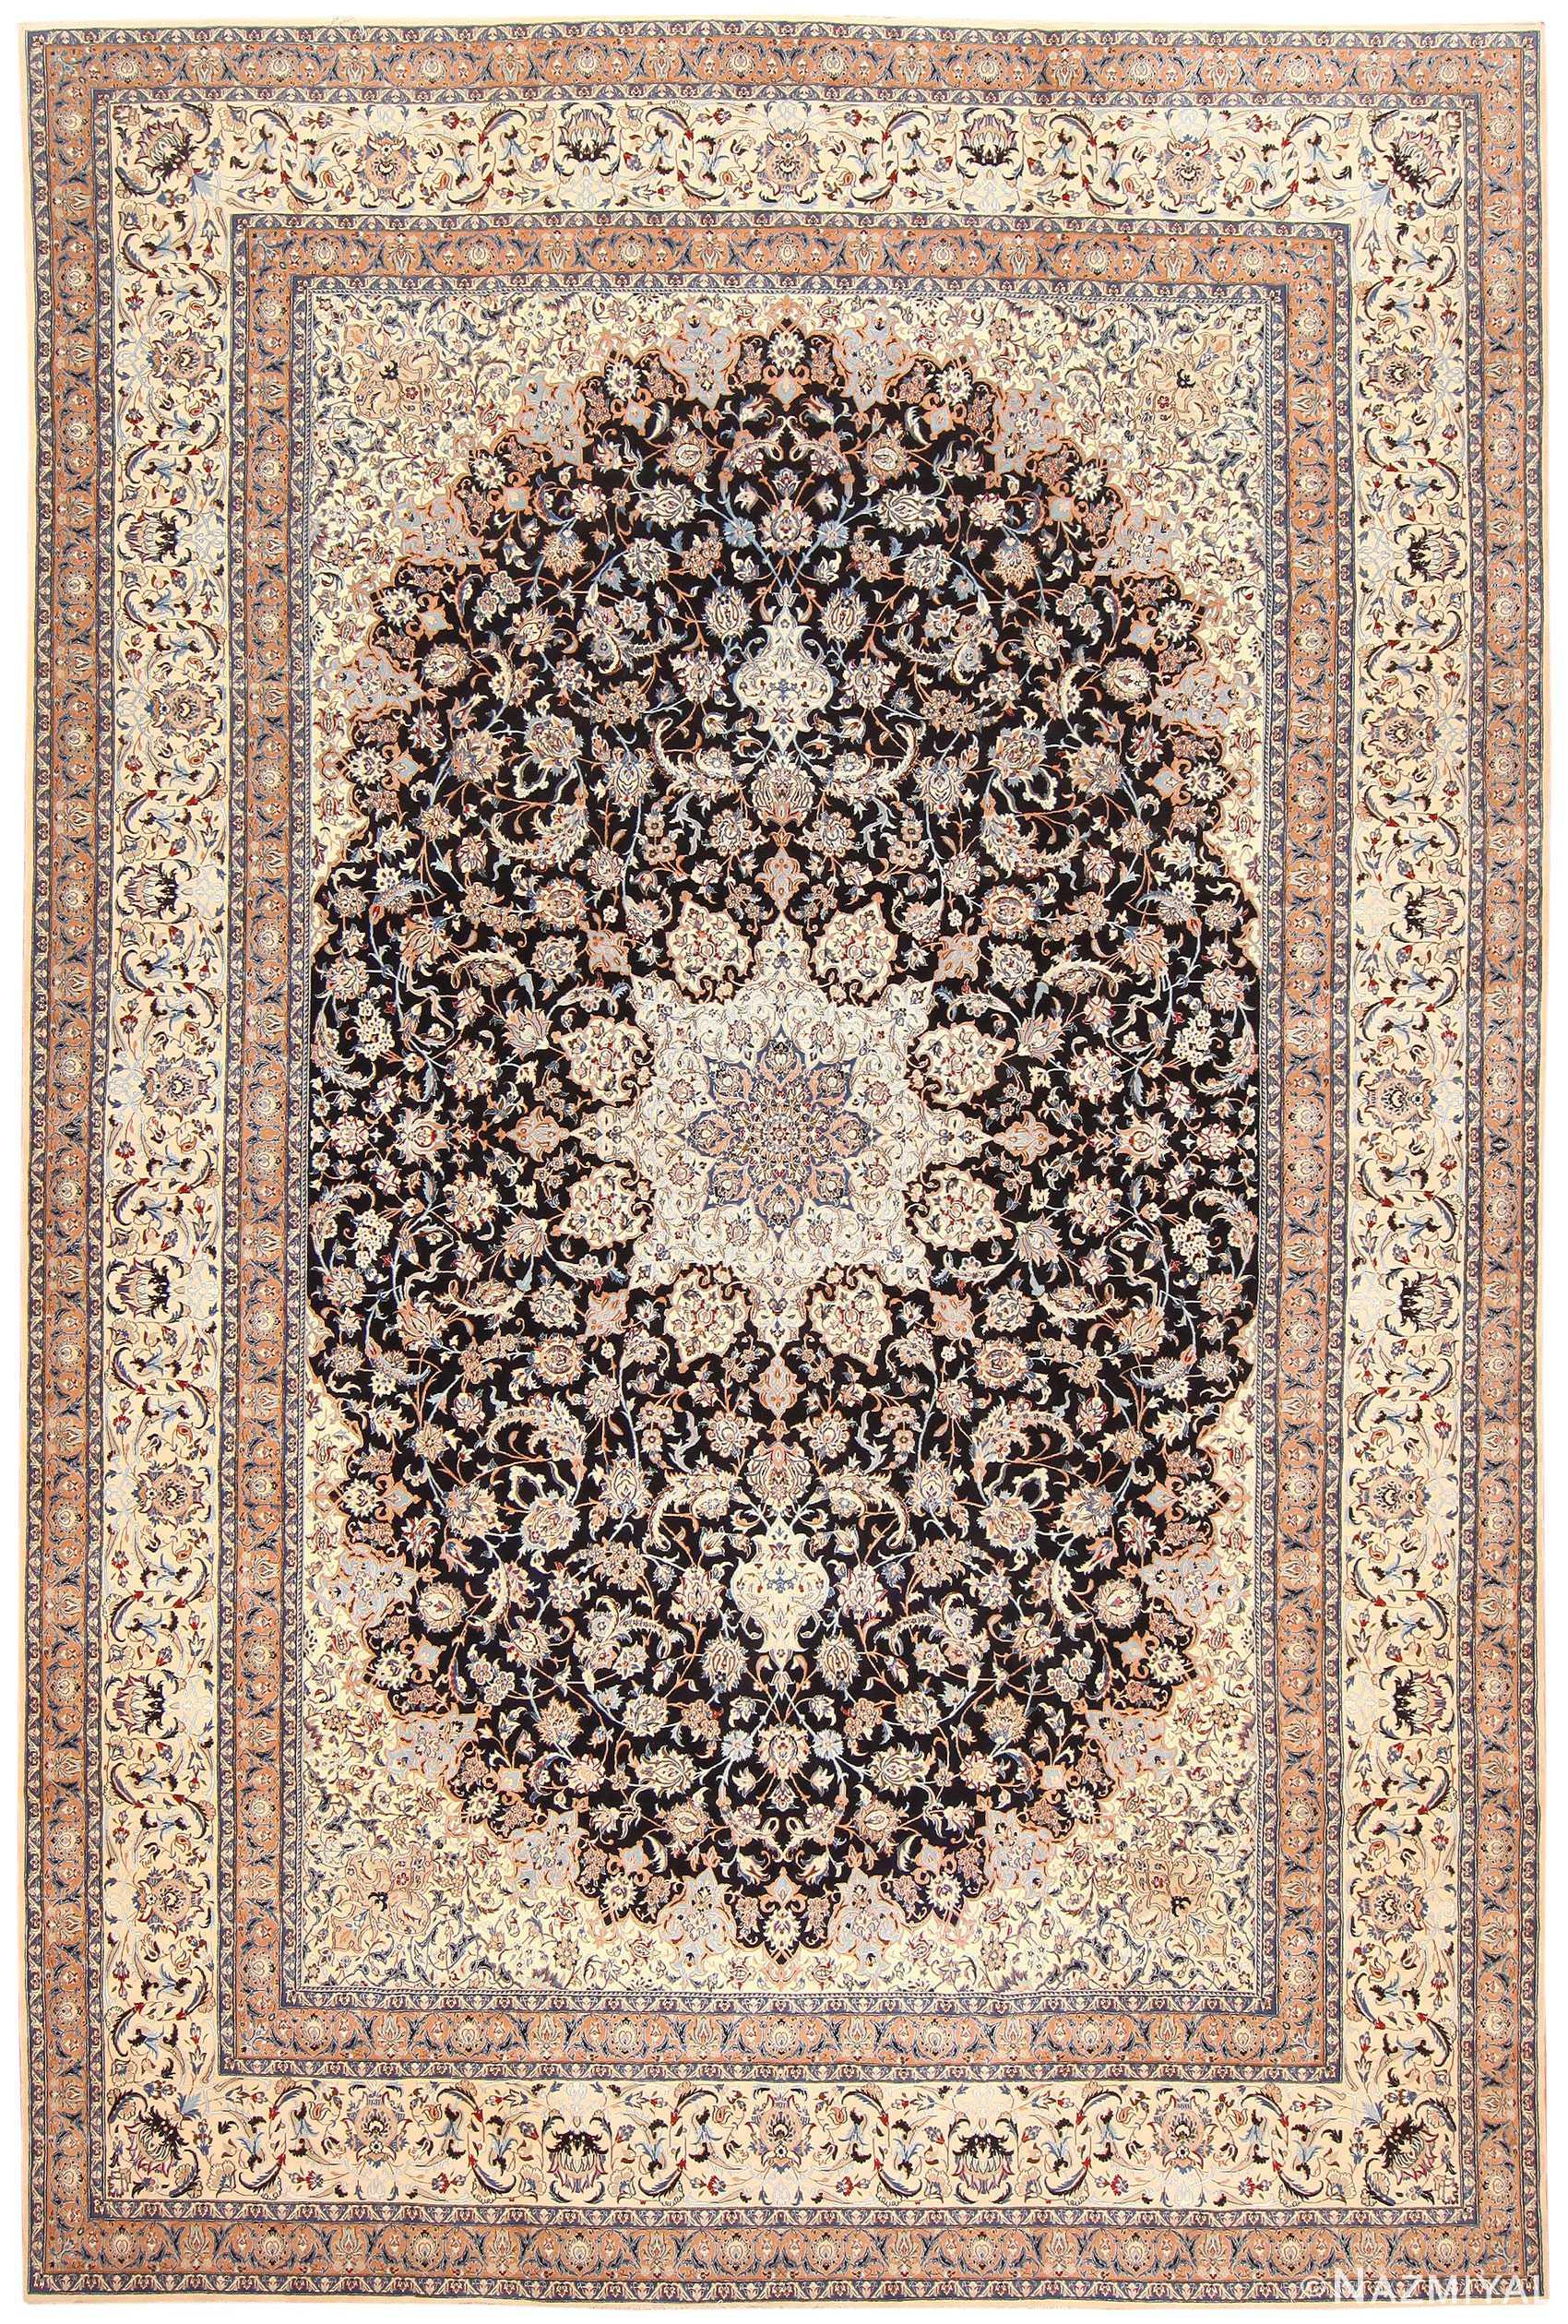 Persian Nain Carpet 50318 Detail/Large View